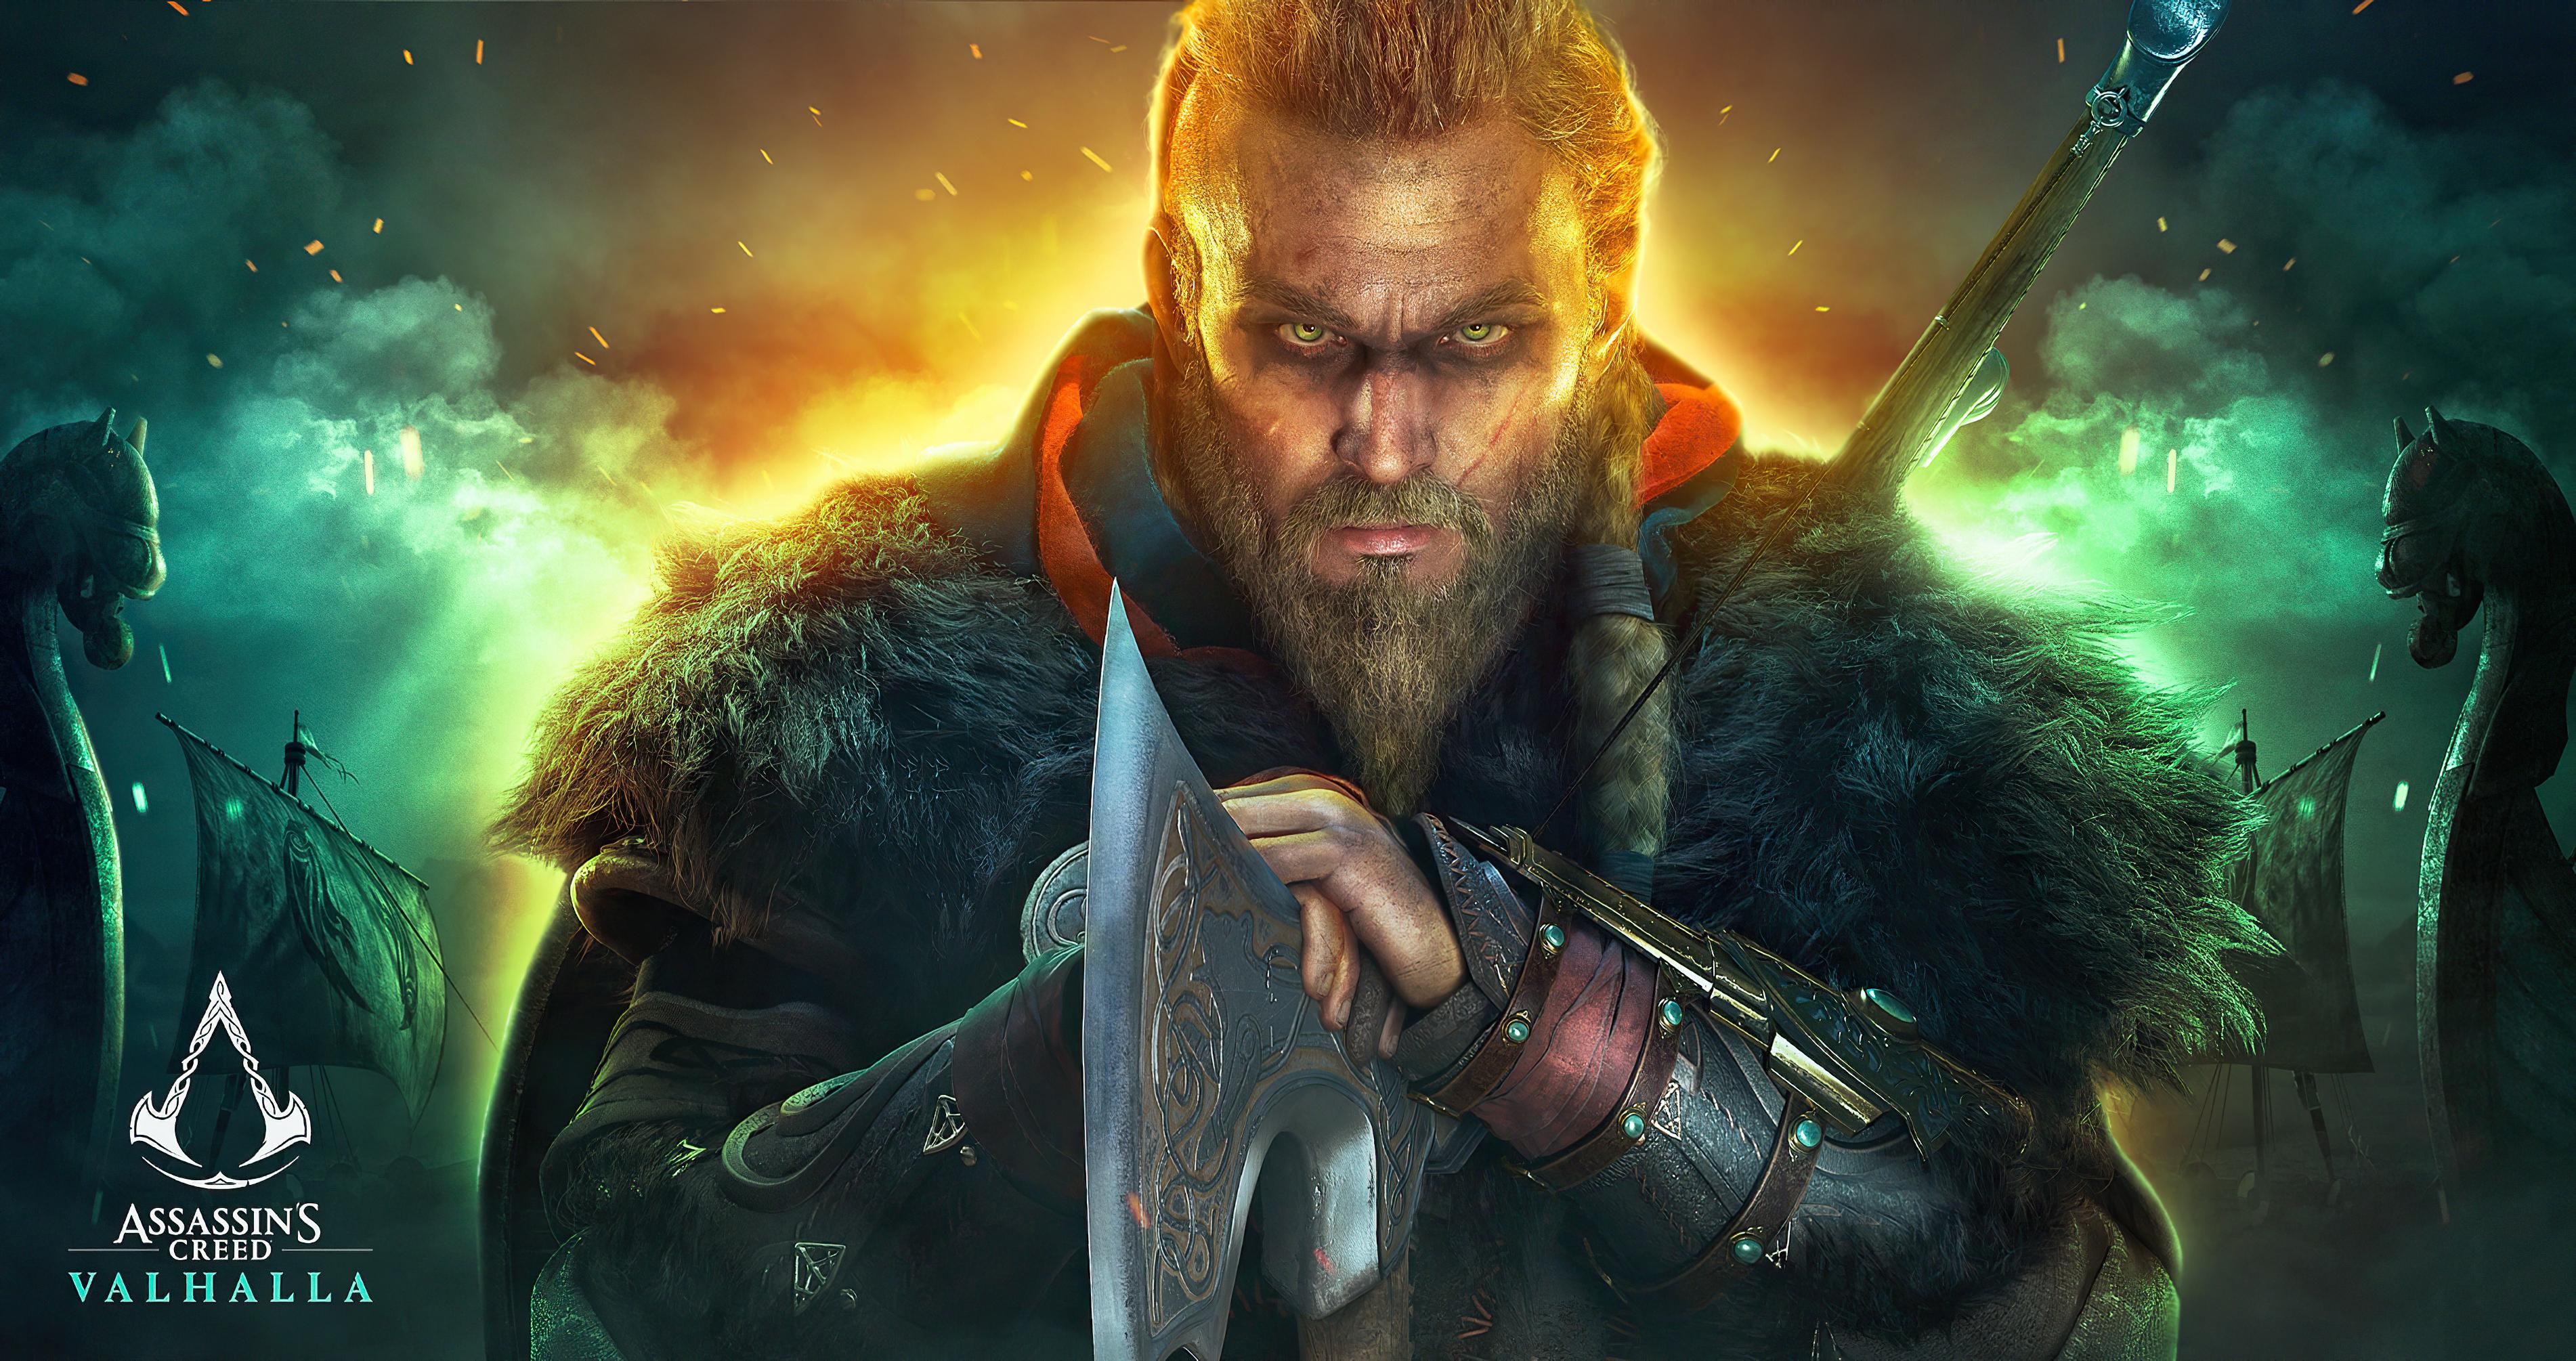 Assassin S Creed Valhalla 4k Wallpaper Eivor Viking Raider Pc Games Playstation 4 Playstation 5 Xbox One Games 1045